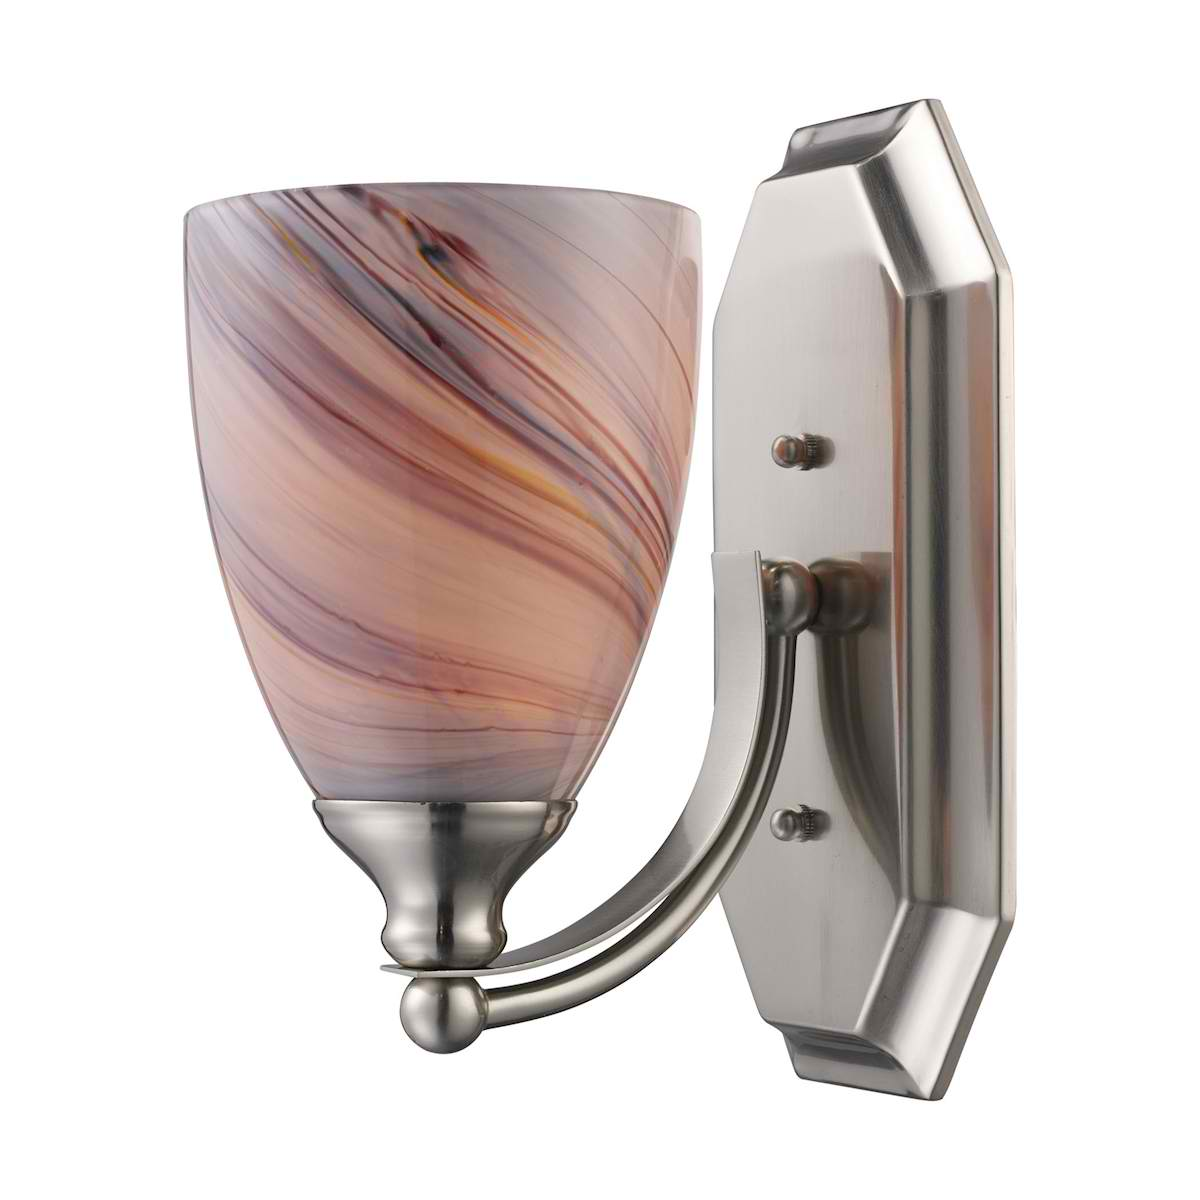 Vanity 1 Light Satin Nickel with Creme Glass